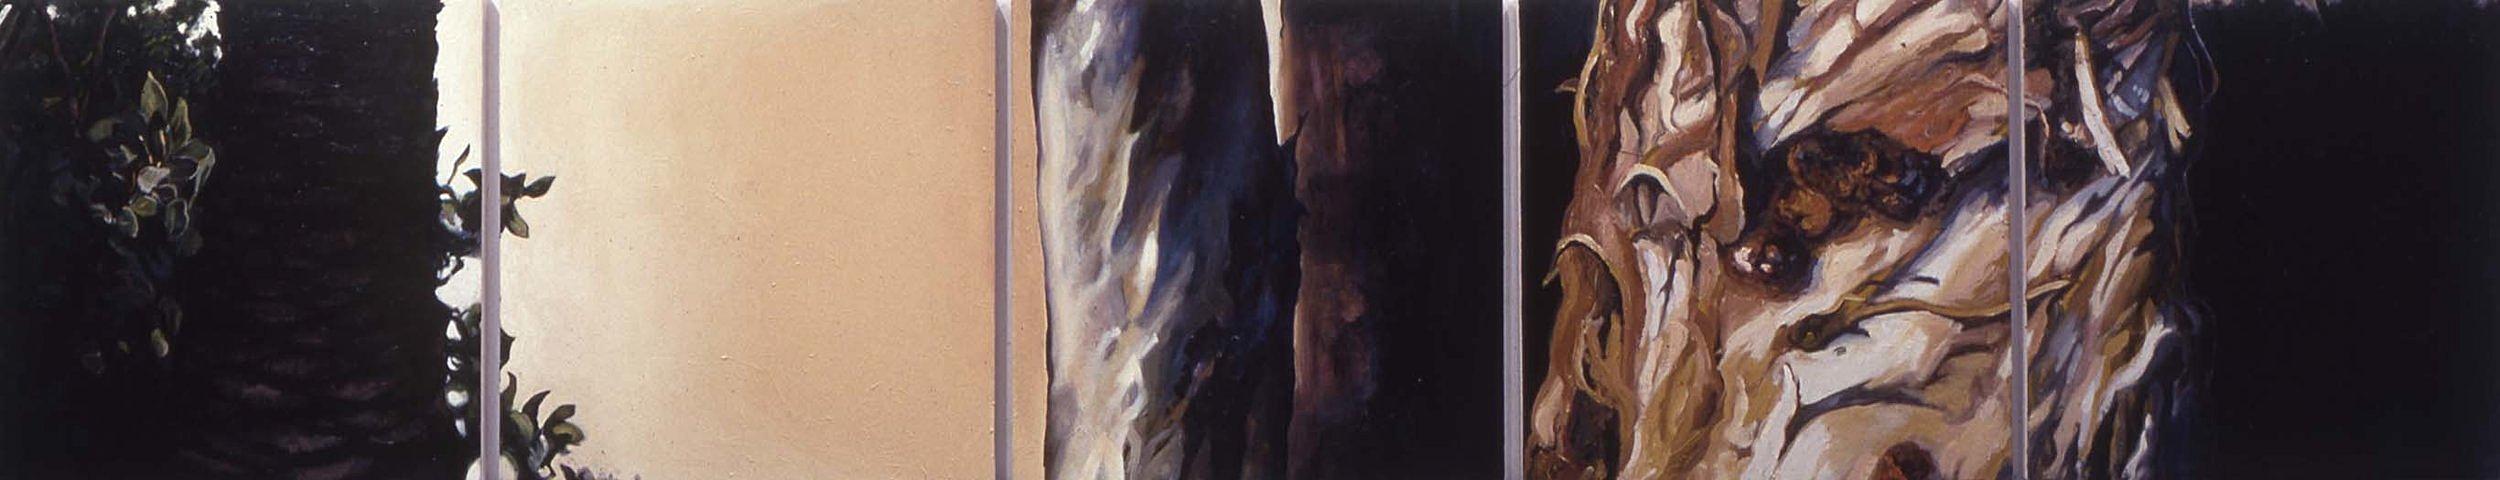 Enclosure, 1989